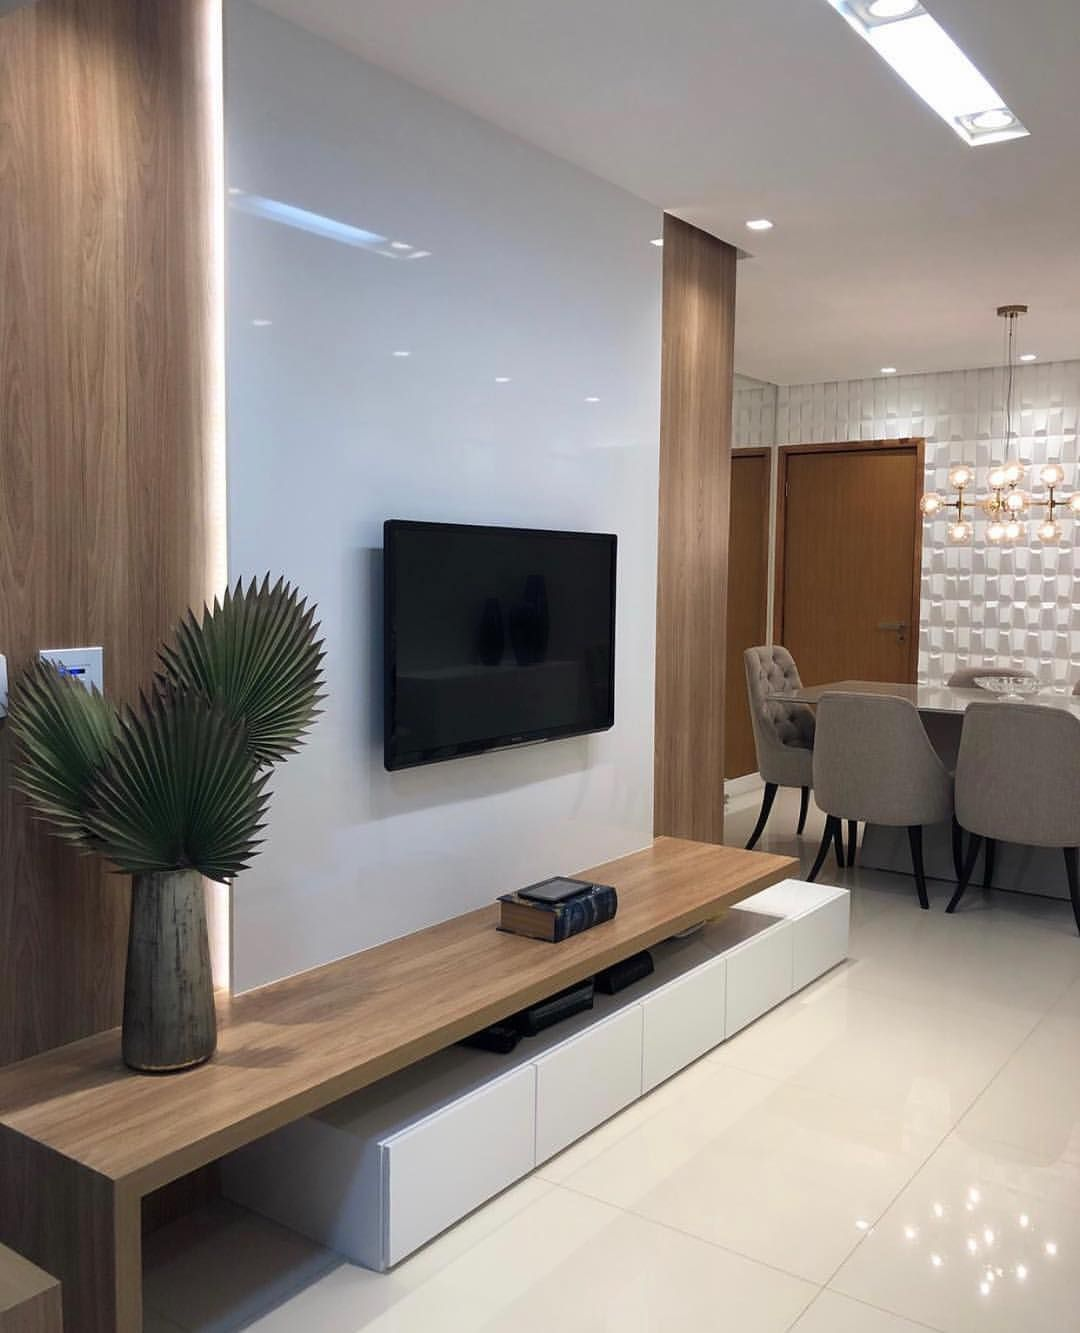 Home idea por dani porto no instagram  cclean  belo amei also tv unit for living room bhk interior design in rh pinterest